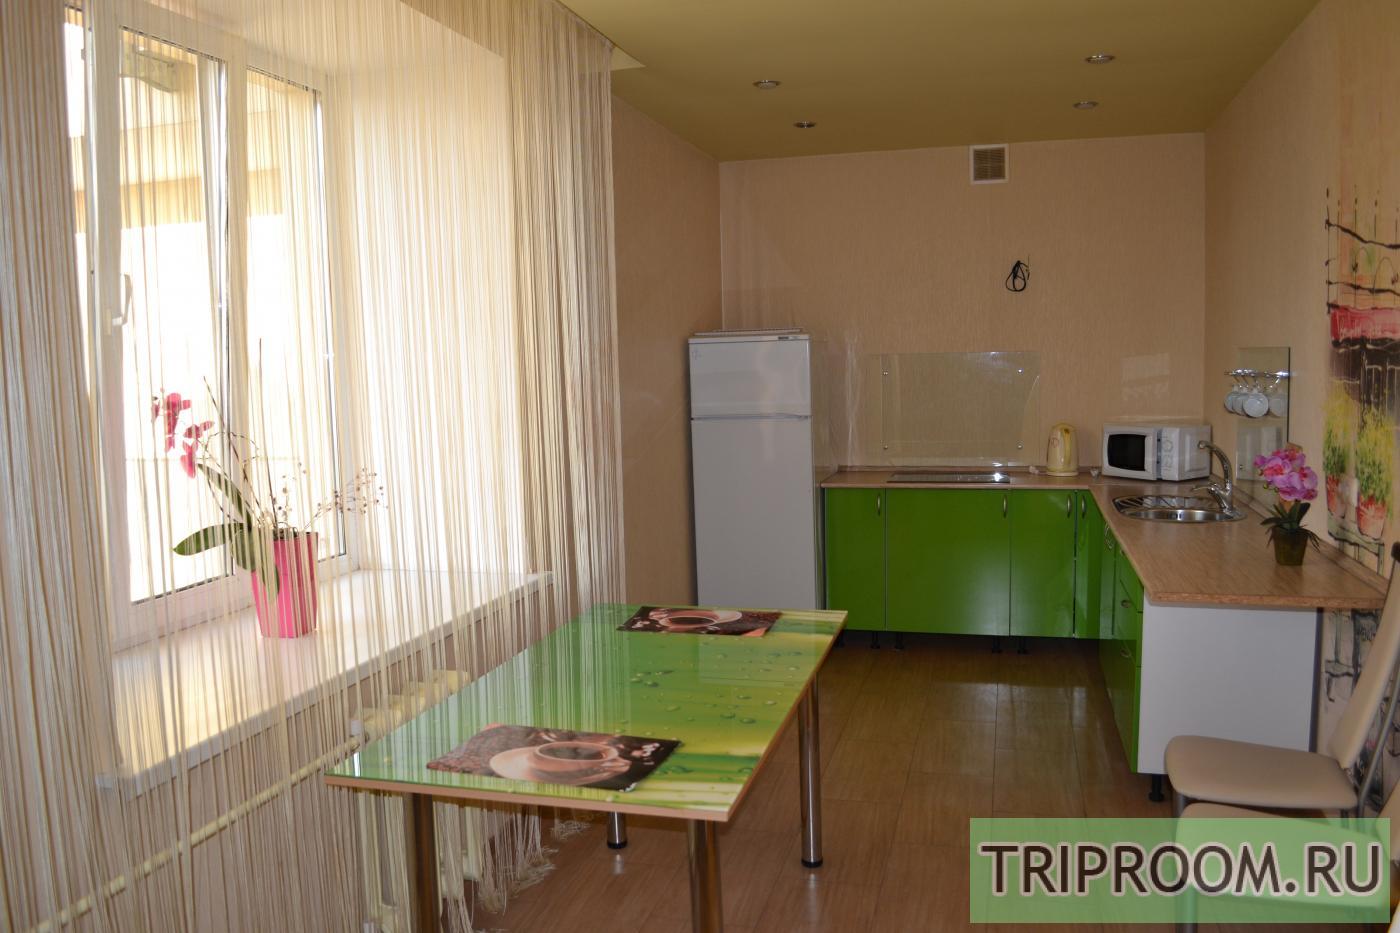 1-комнатная квартира посуточно (вариант № 591), ул. Революции проспект, фото № 3